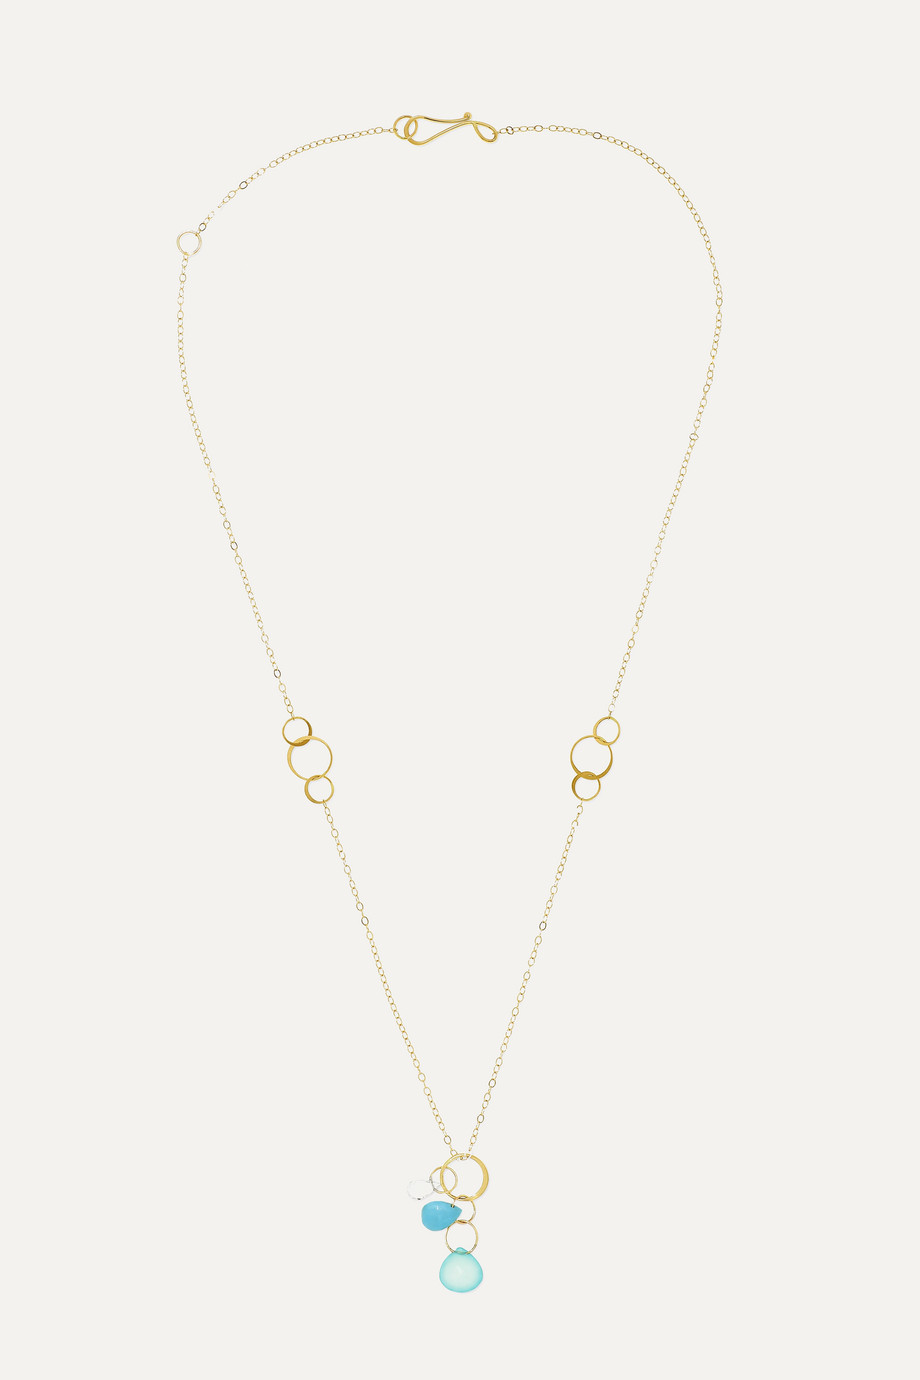 Melissa Joy Manning 14-karat gold multi-stone necklace